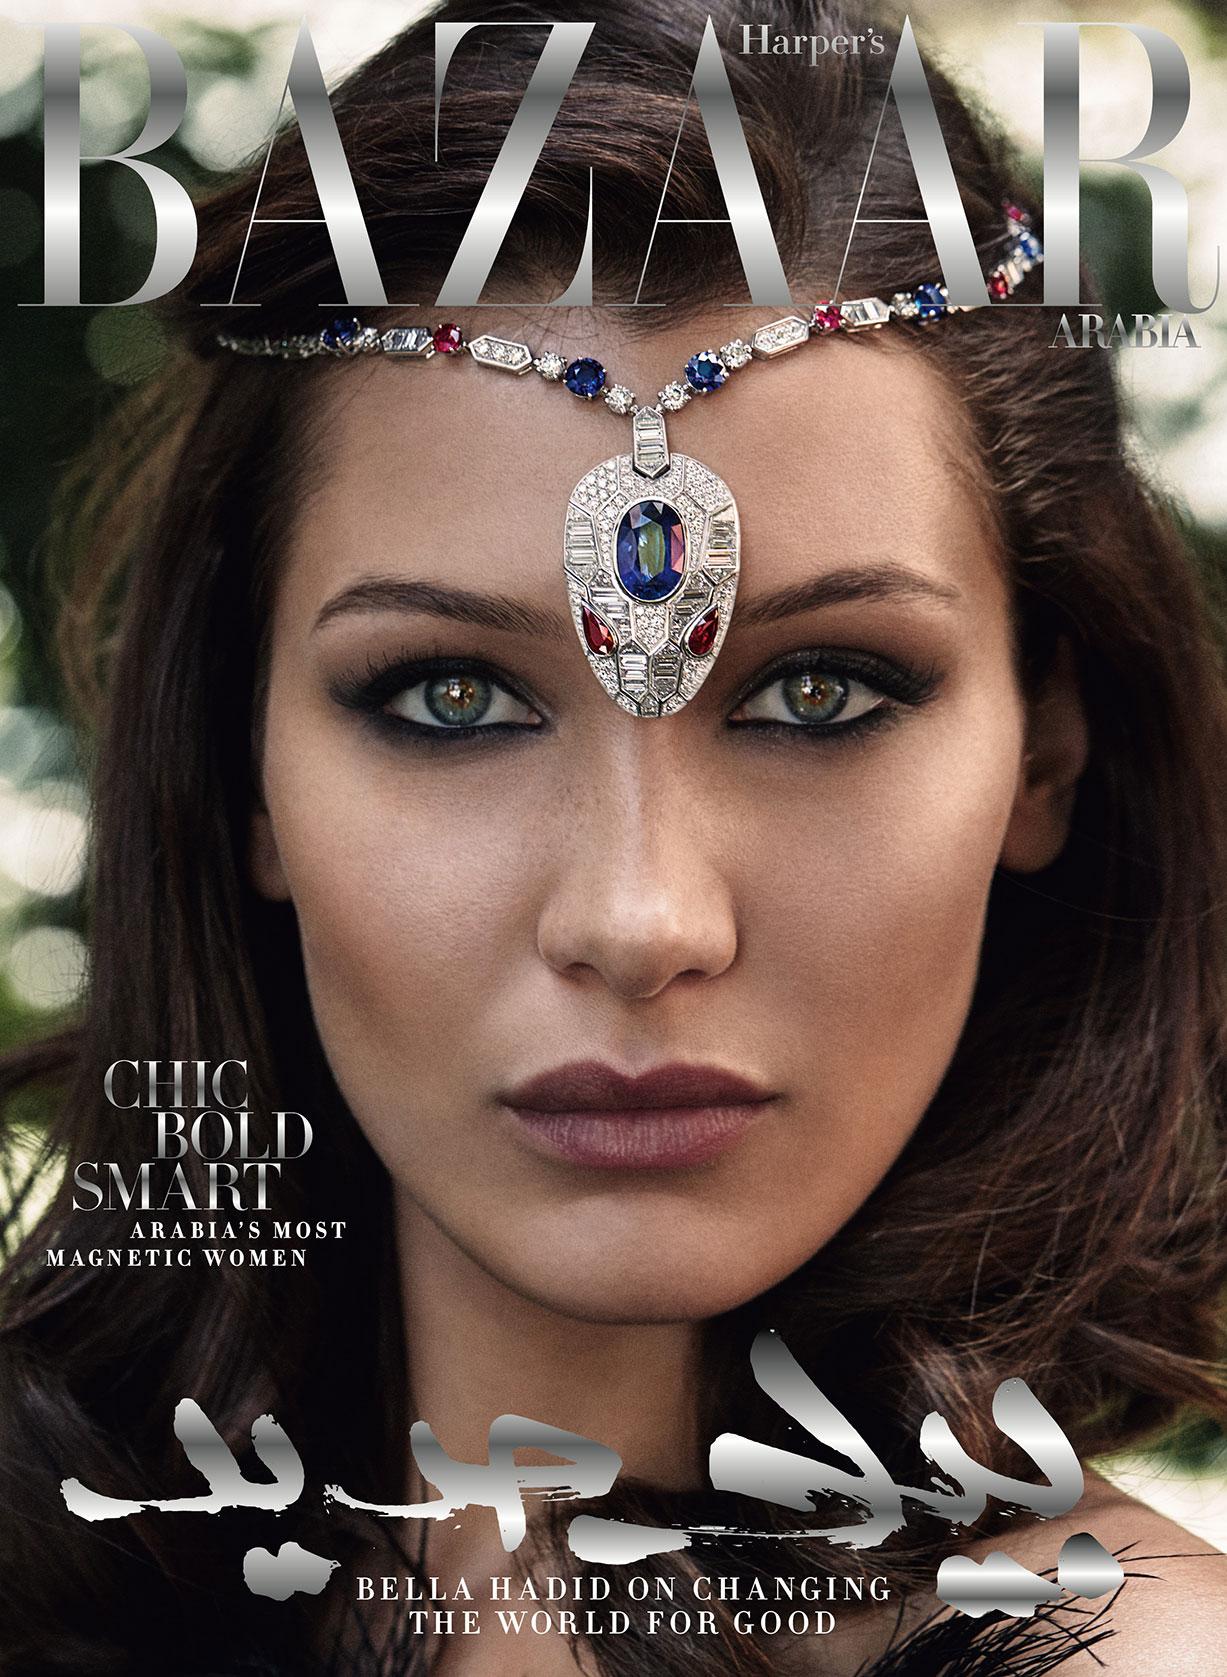 арабская принцесса Белла Хадид / Bella Hadid by Victor Demarchelier - Harpers Bazaar Arabia october 2017